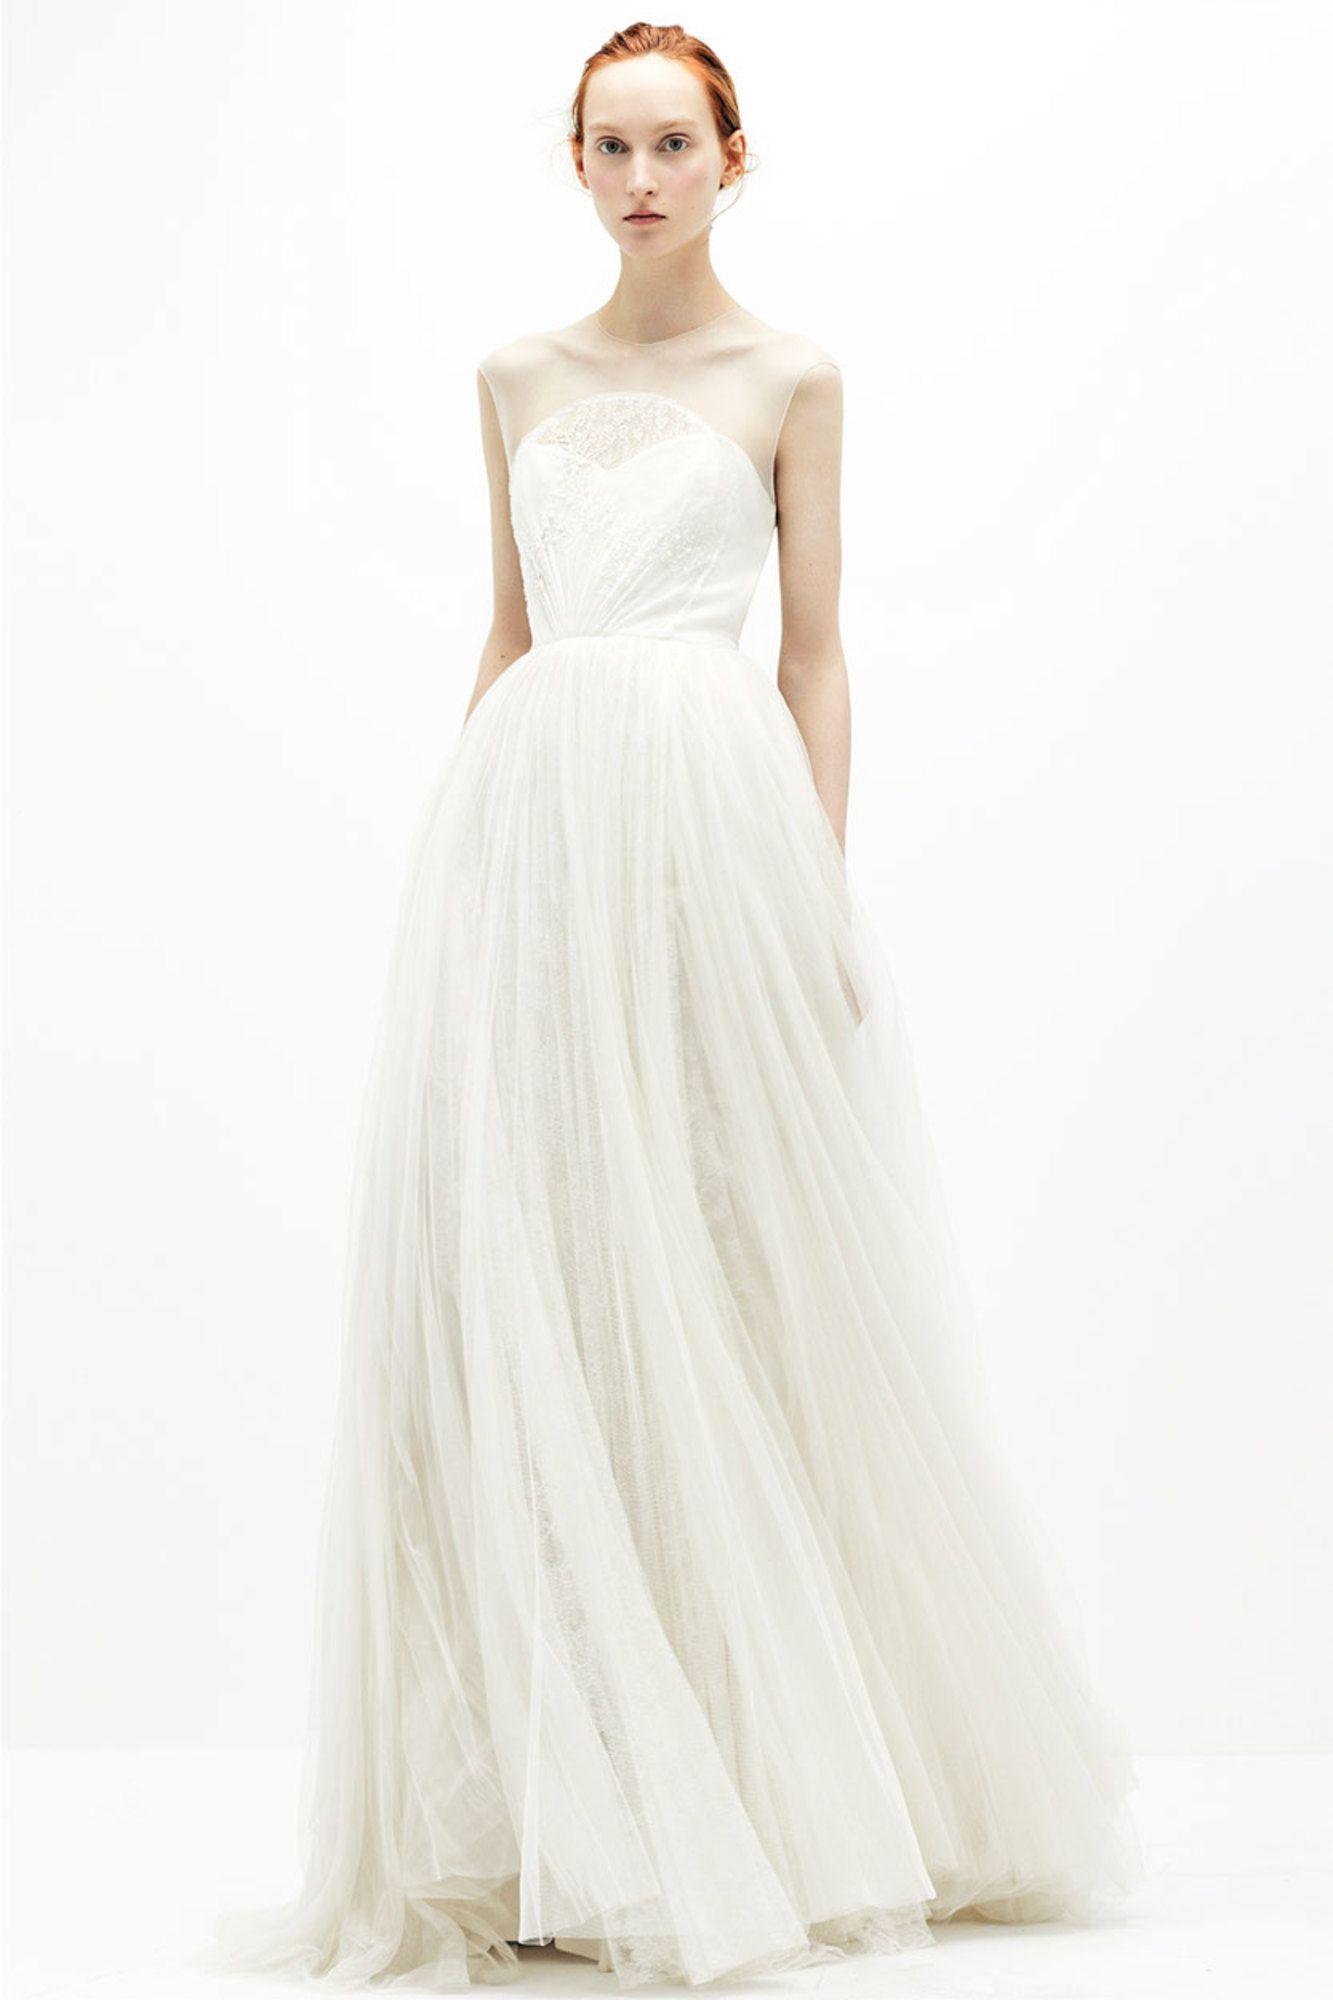 Delpozo bridal capsule collection designers collections